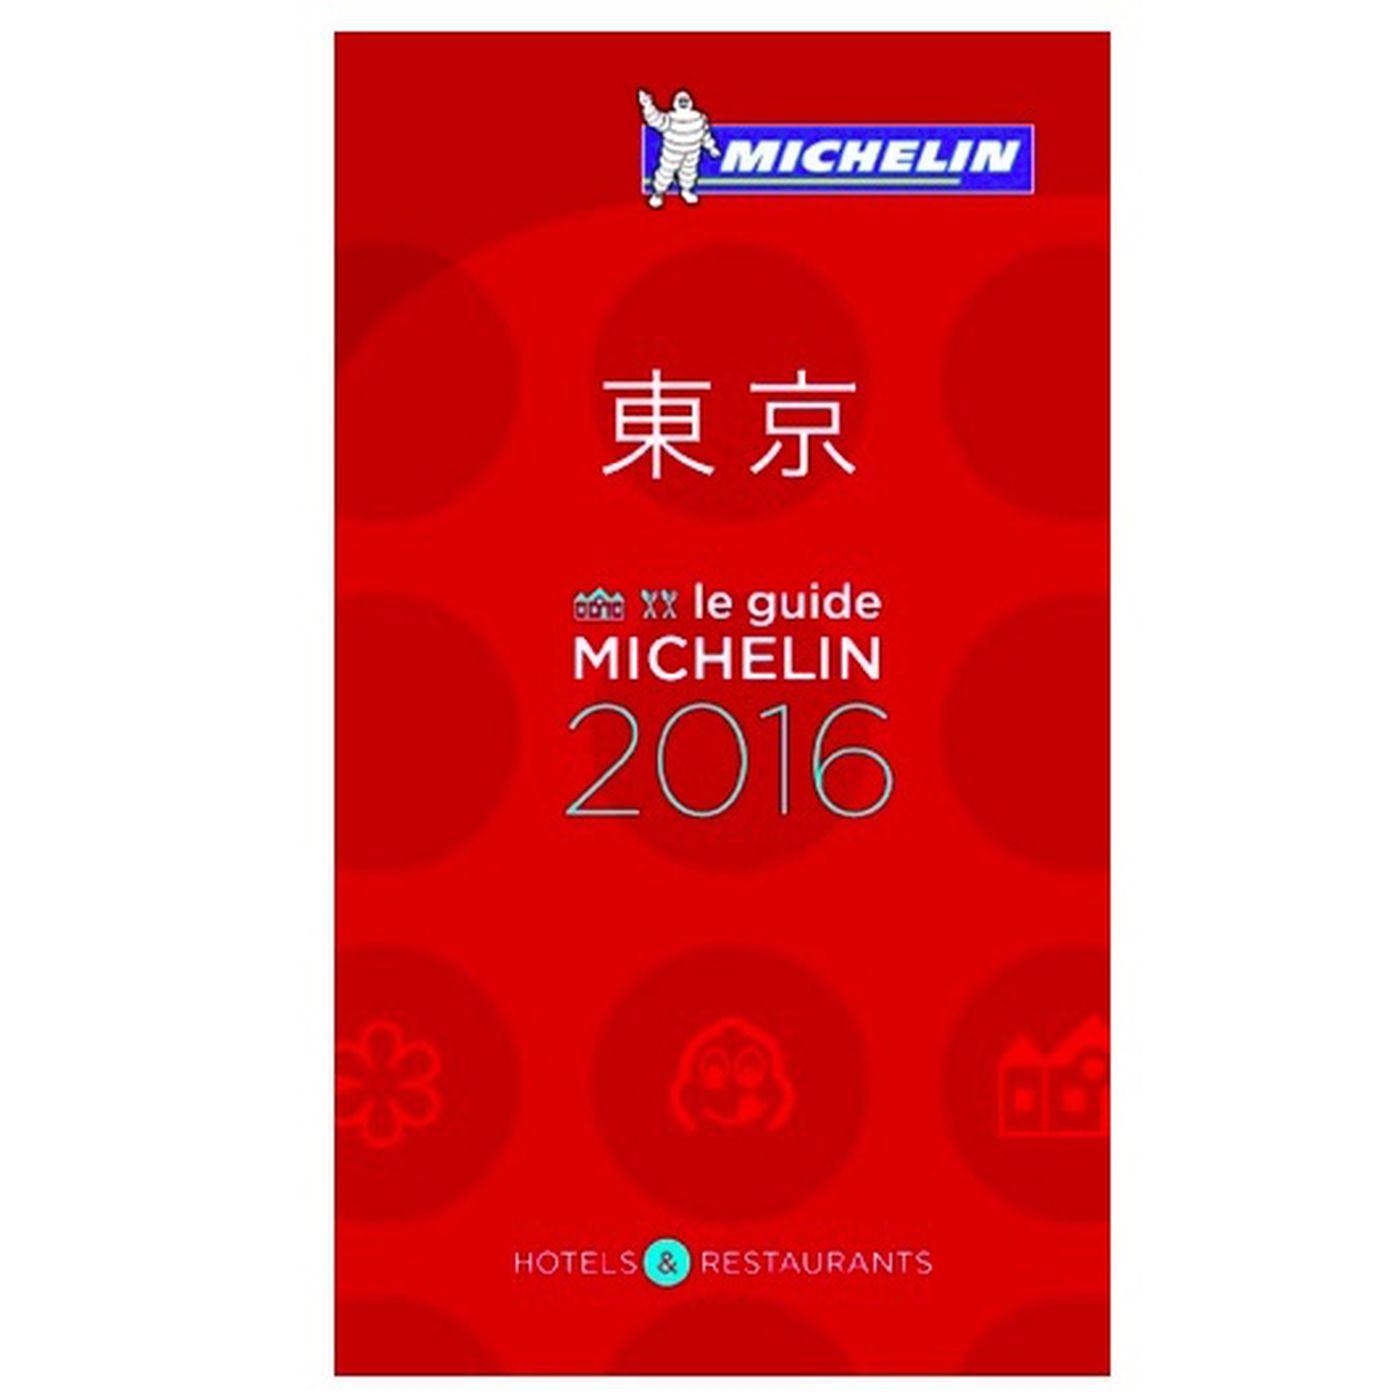 Michelin Announces 2016 Stars for Tokyo - Eater 6ed59d4da1aa